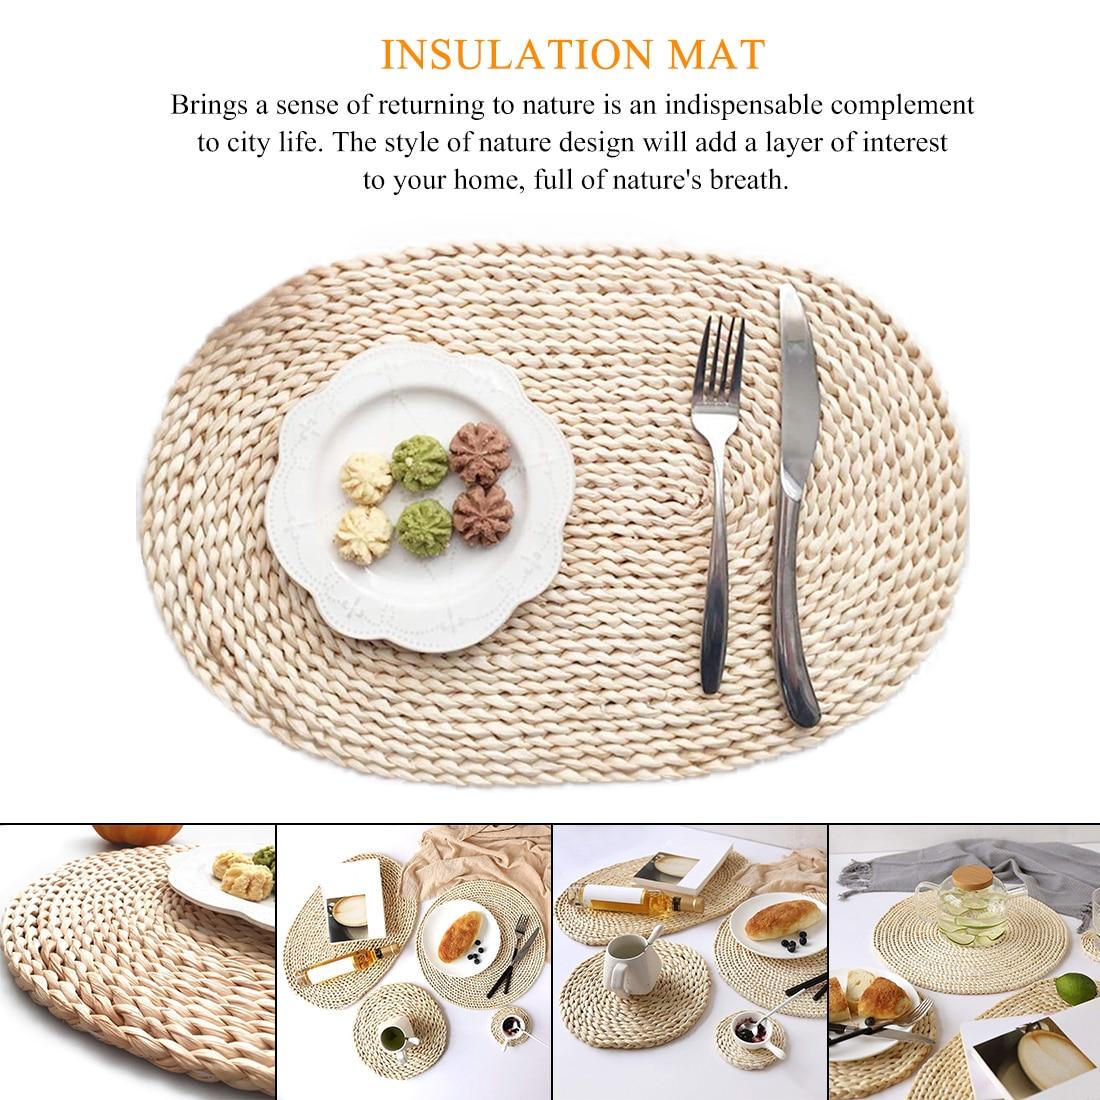 Ratten Woven Heat Insulation Kithchen Utensil Tablemat Placemat Coaster Holder